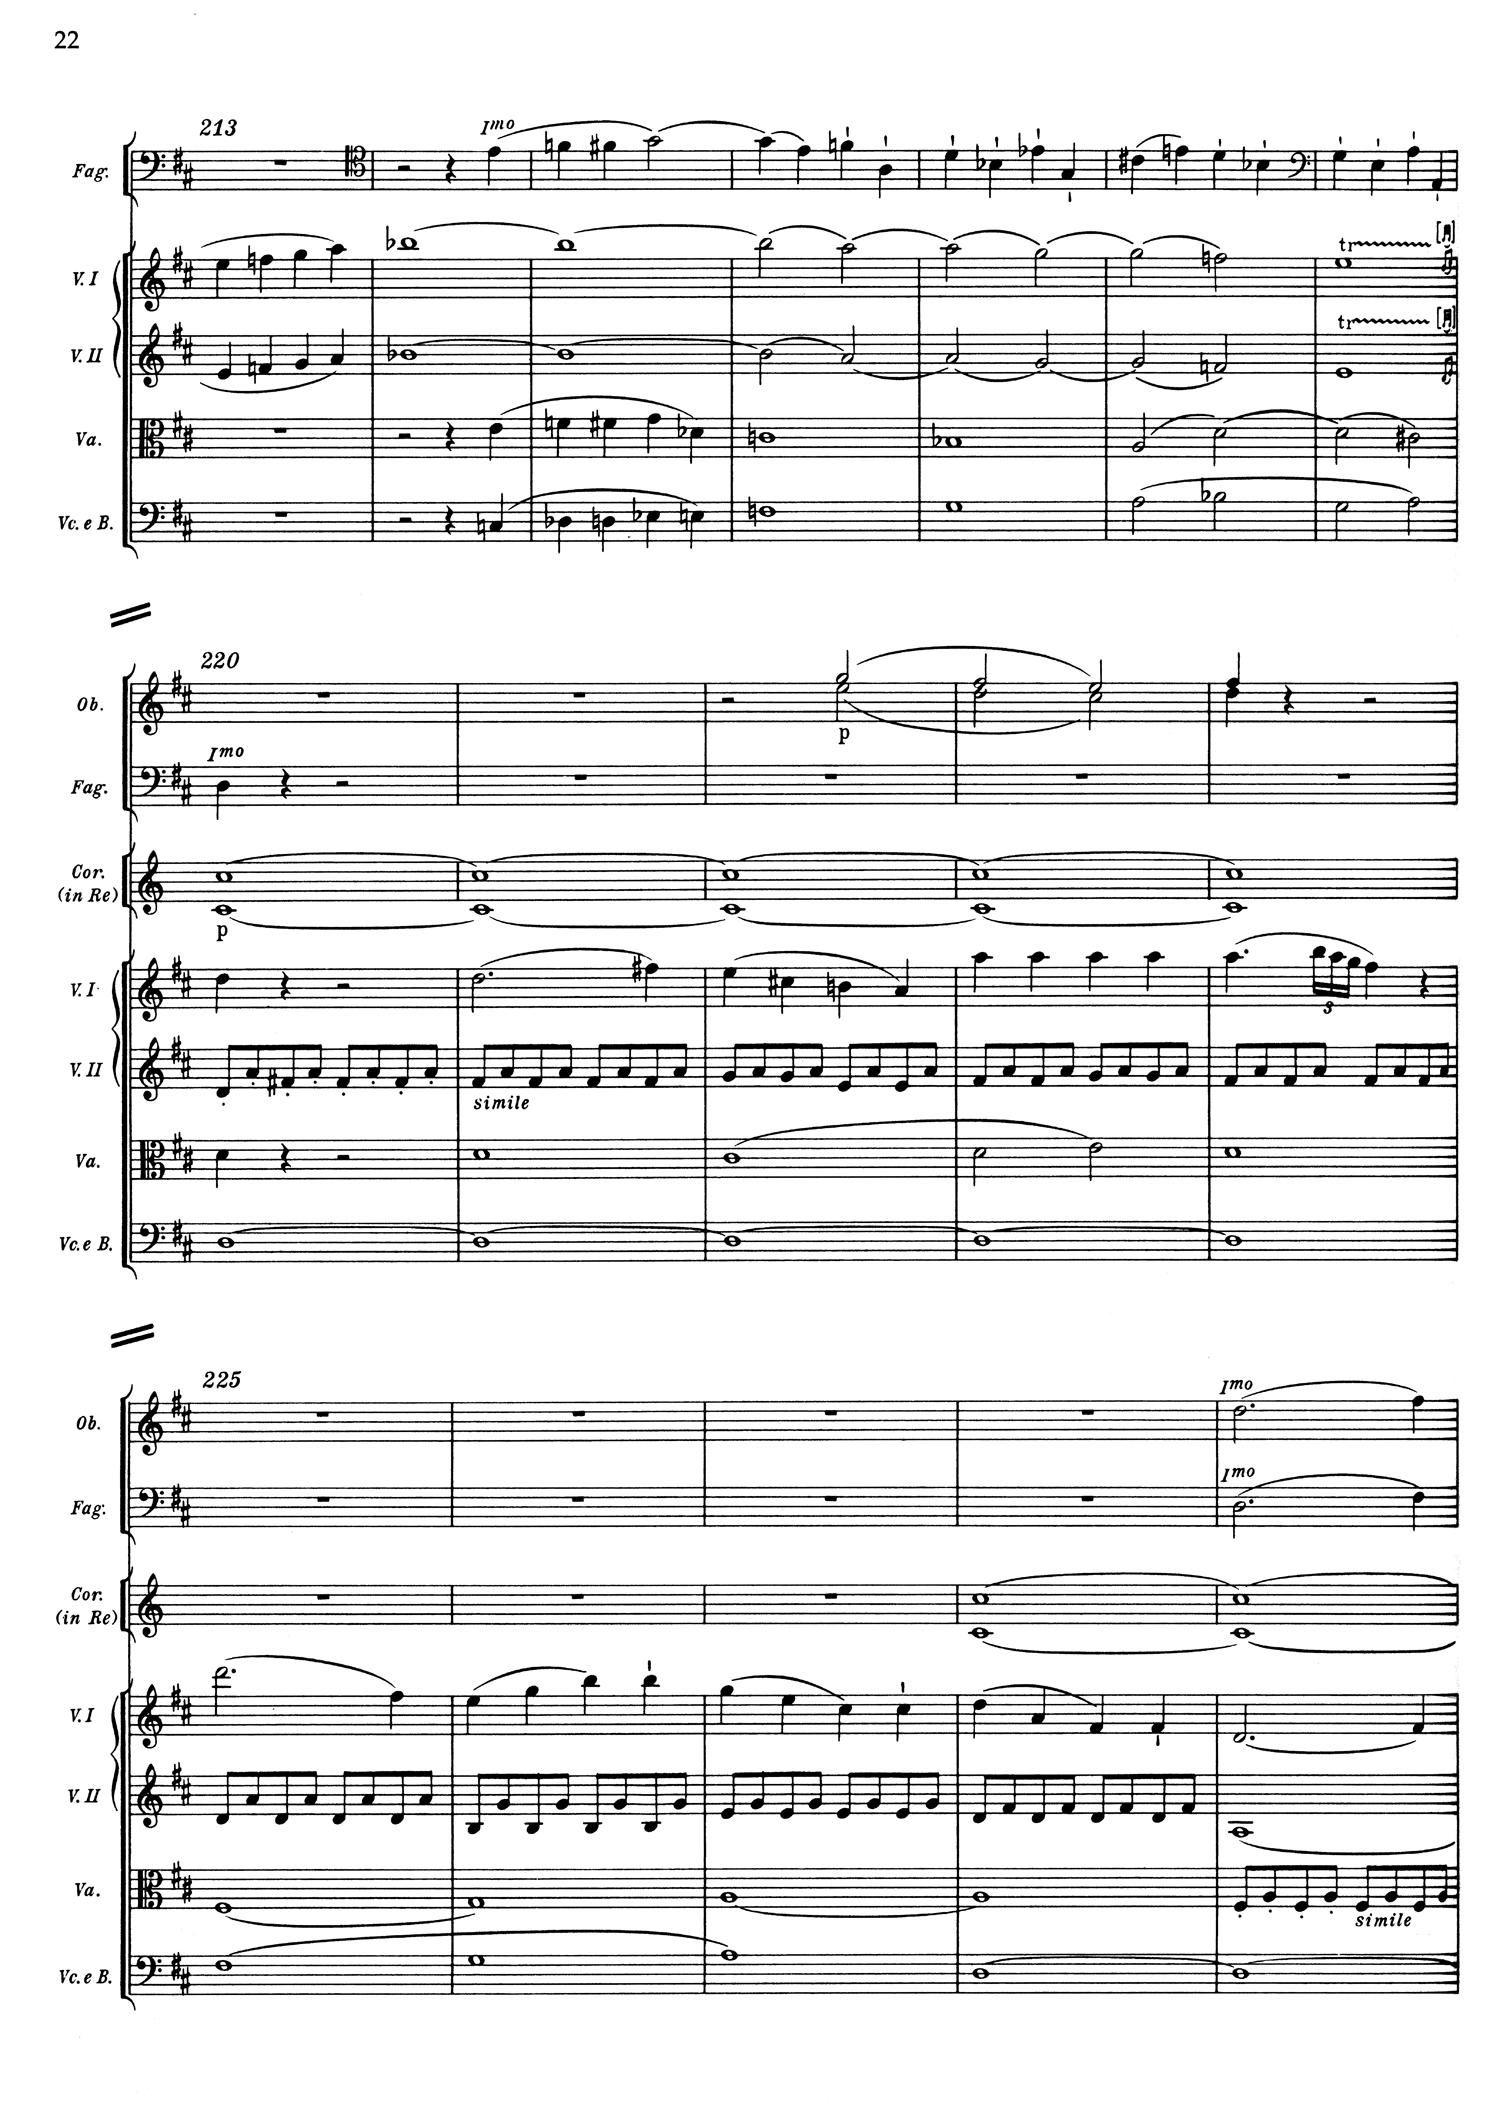 Mozart Figaro Score 11.jpg